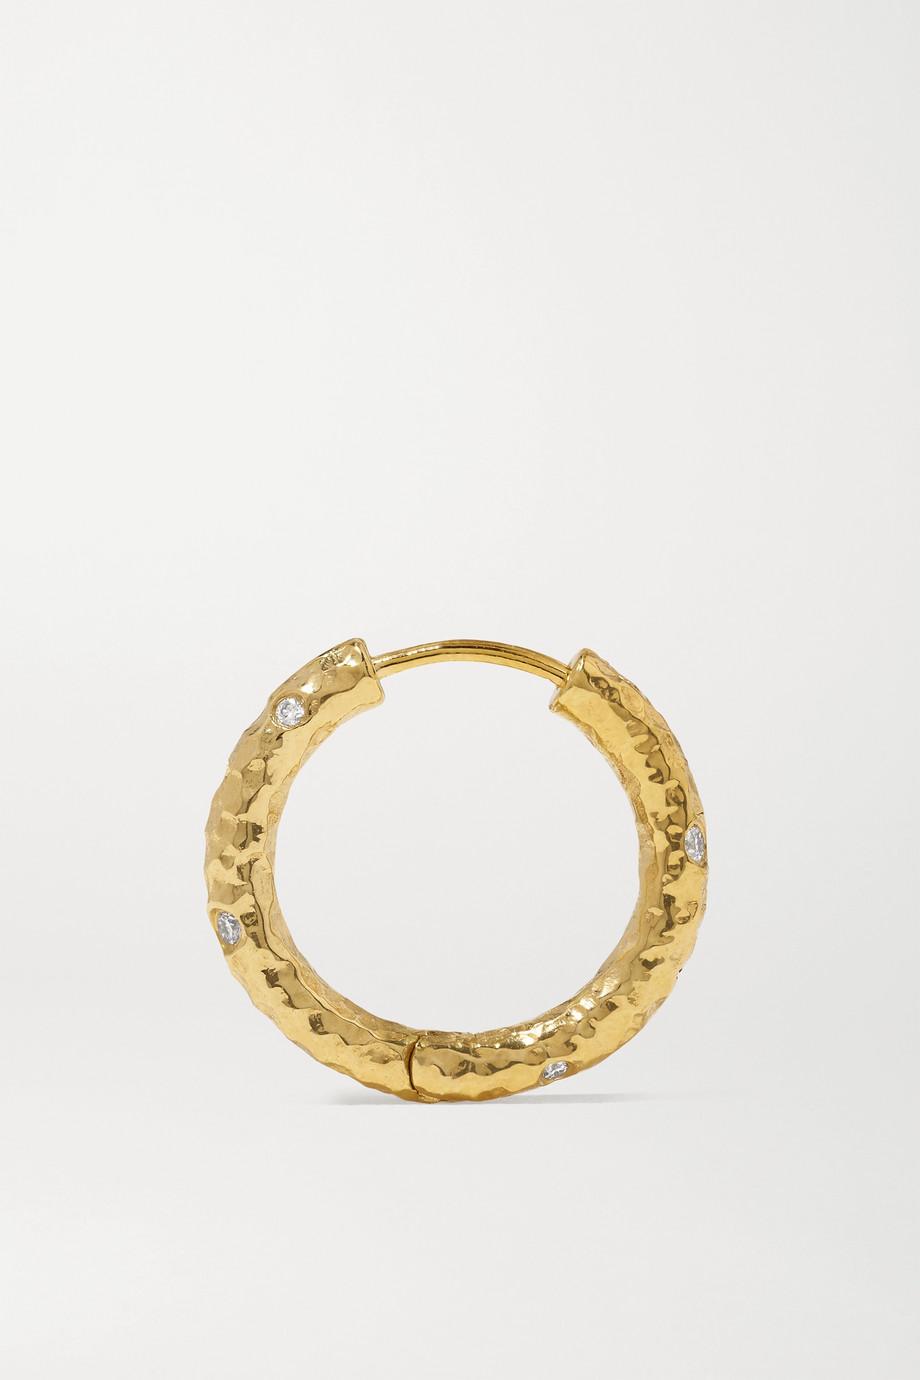 Octavia Elizabeth + NET SUSTAIN Nesting Gem Gabby 18-karat recycled gold diamond hoop earrings